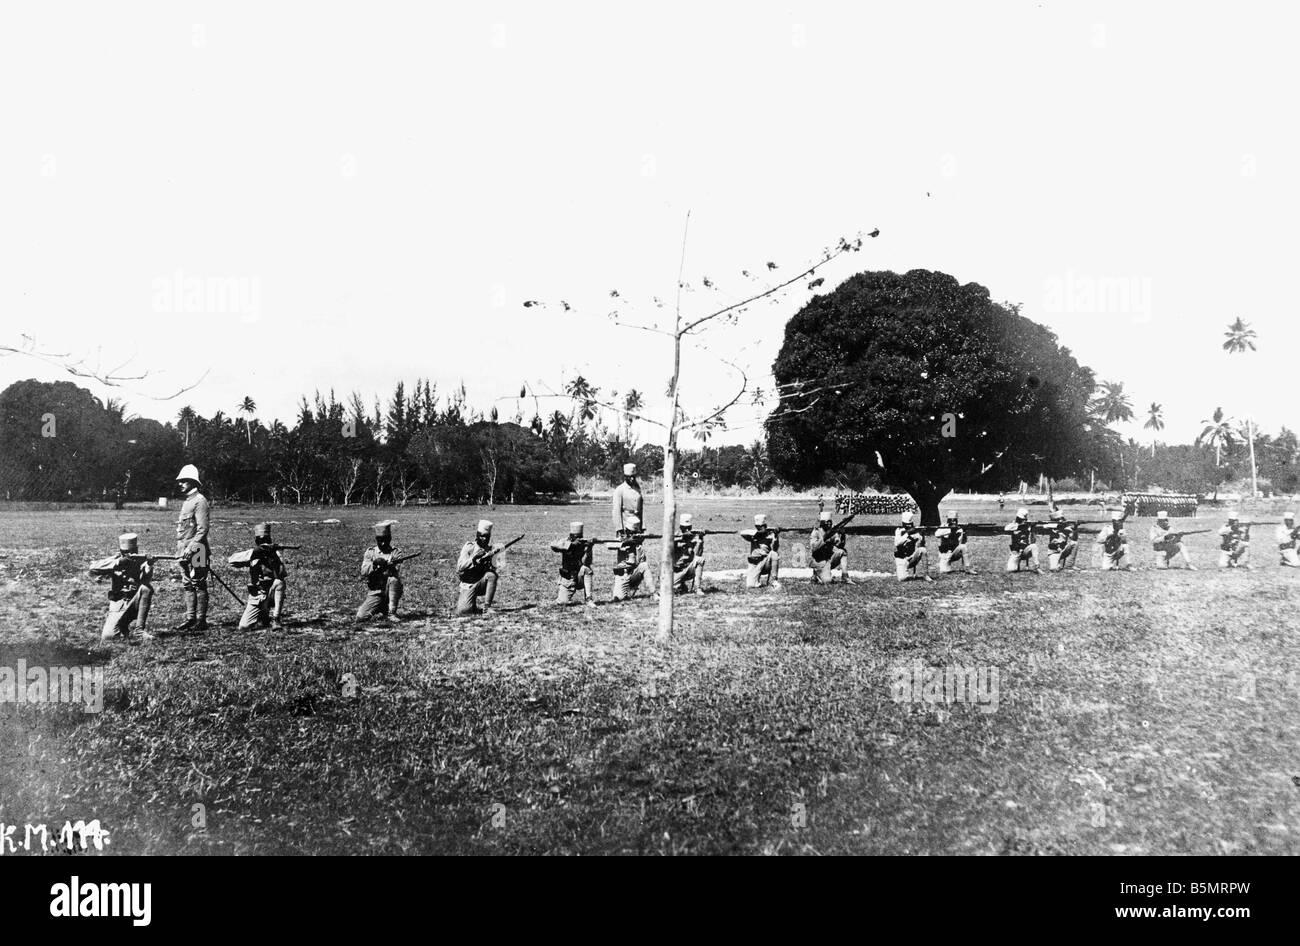 9AF 1914 0 0 A1 1 Hilfstruppen Deutsch-Ostafrika Weltkrieg Krieg in den Kolonien Deutsch-Ostafrika heute Tansania Training Stockfoto